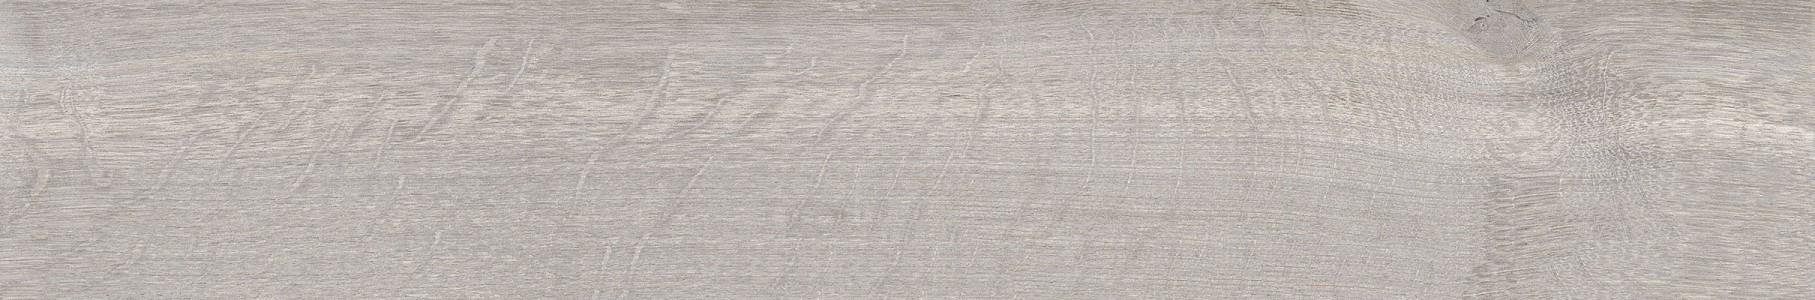 Craven Dunnill CD2M92 Oakmere Floor Tile 1210x200mm - Grey [Pack Quantity 100]